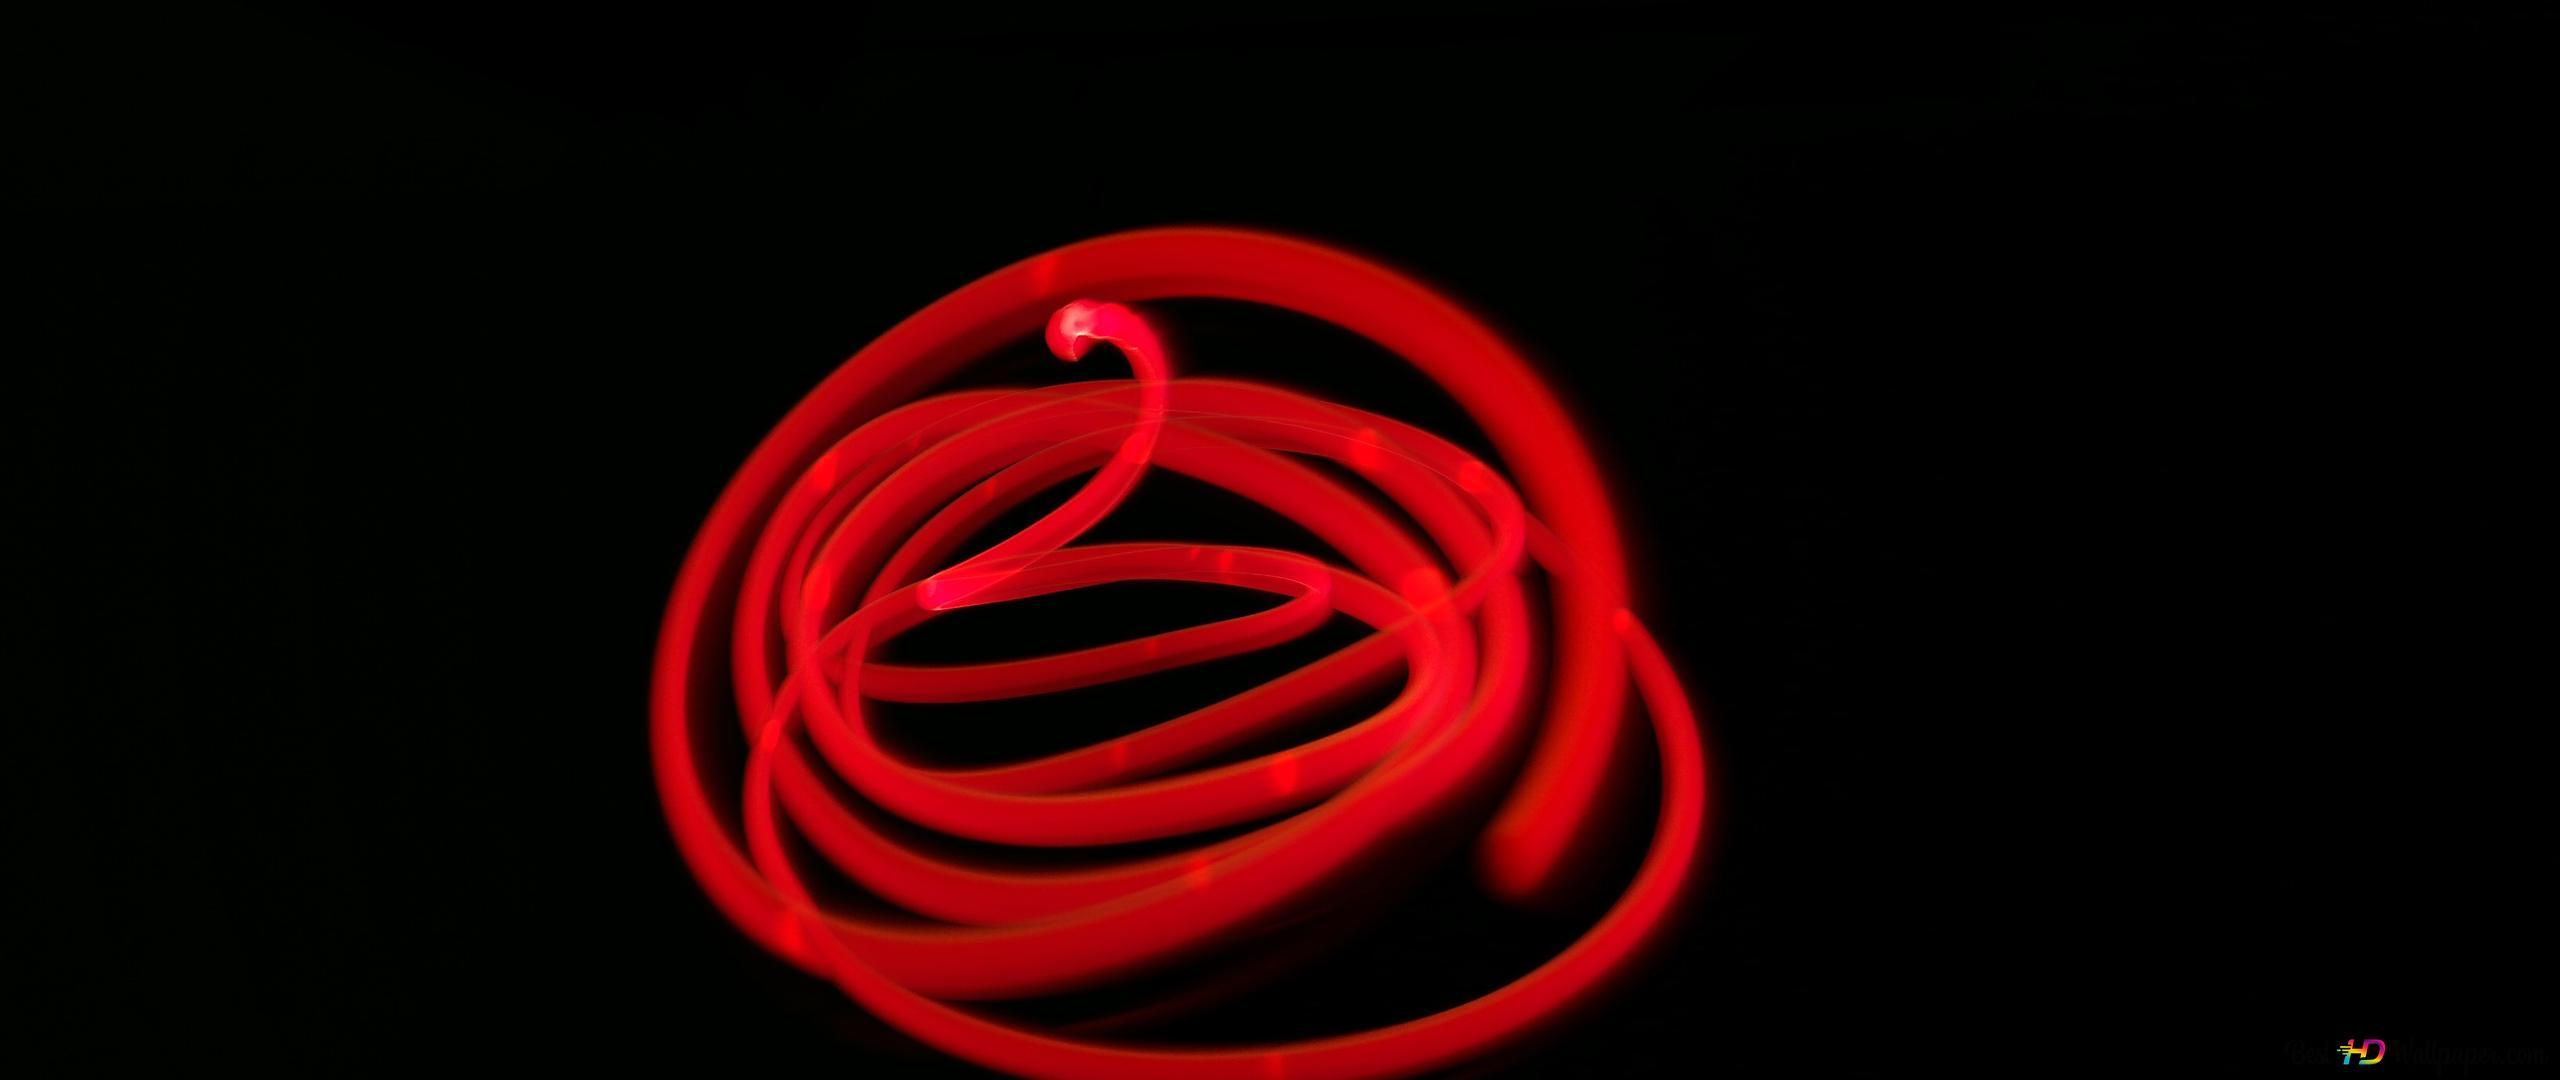 Red Hot Light Trails Hd Wallpaper Download